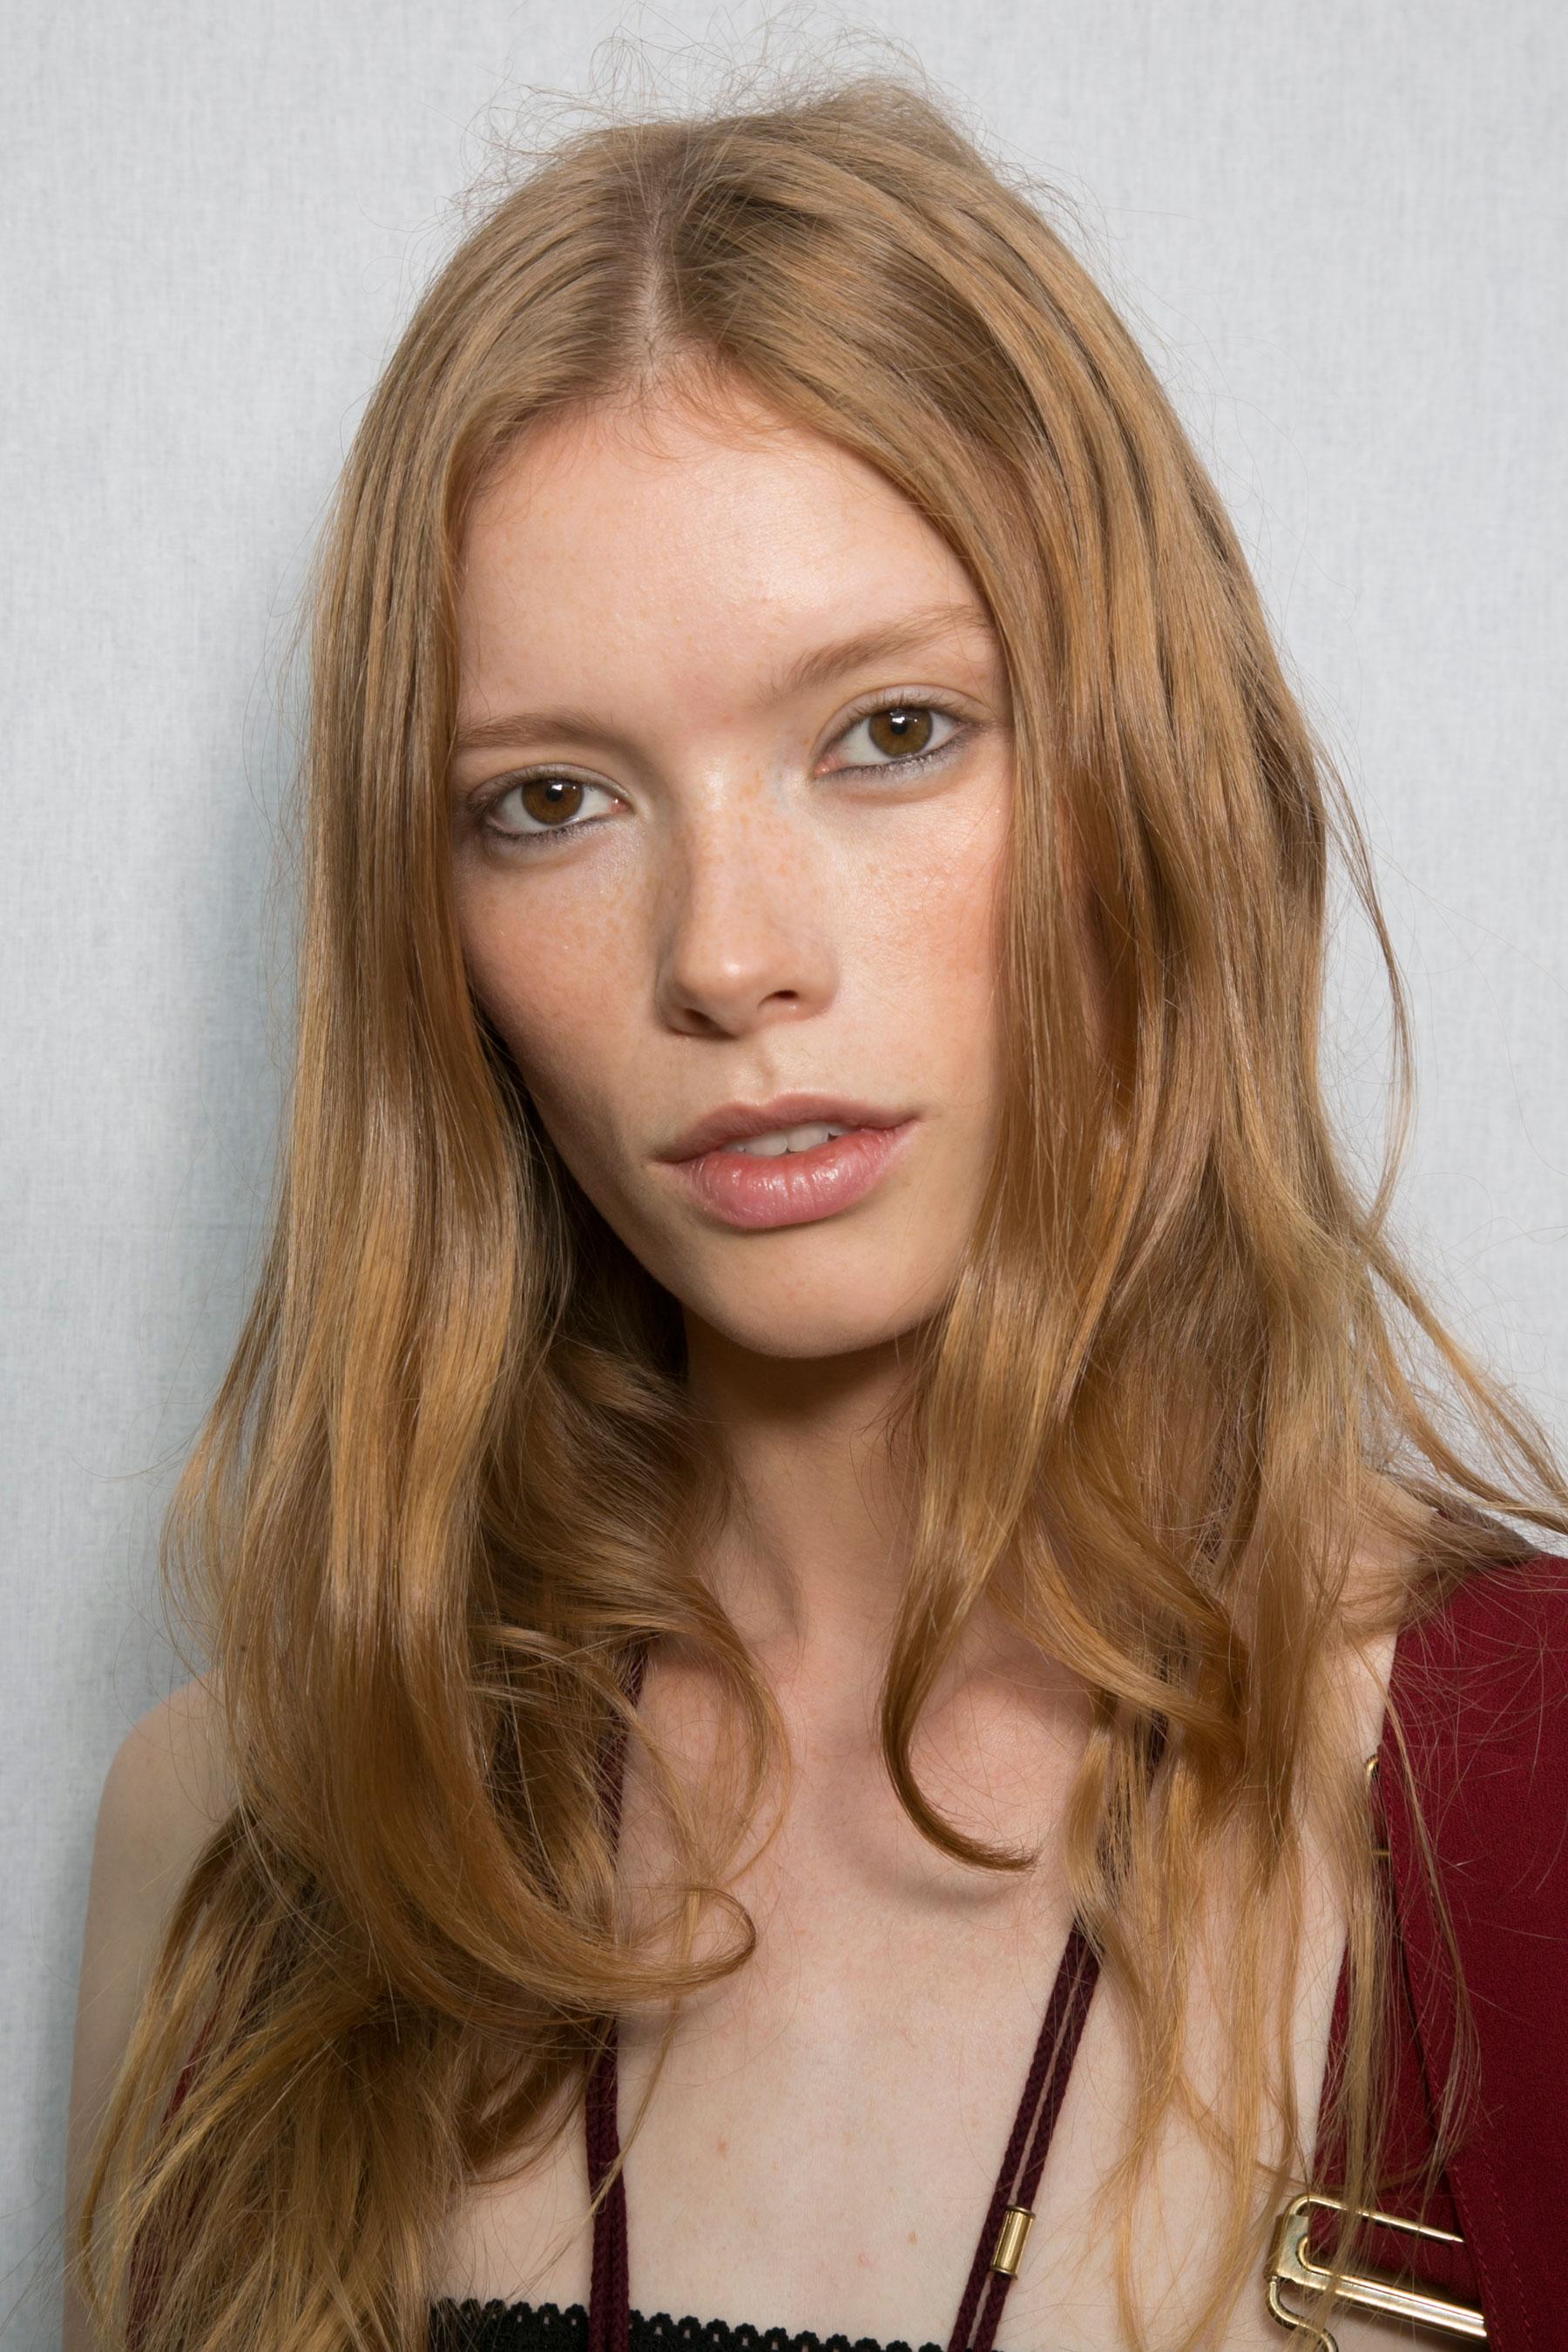 Chloe-spring-2016-beauty-fashion-show-the-impression-056